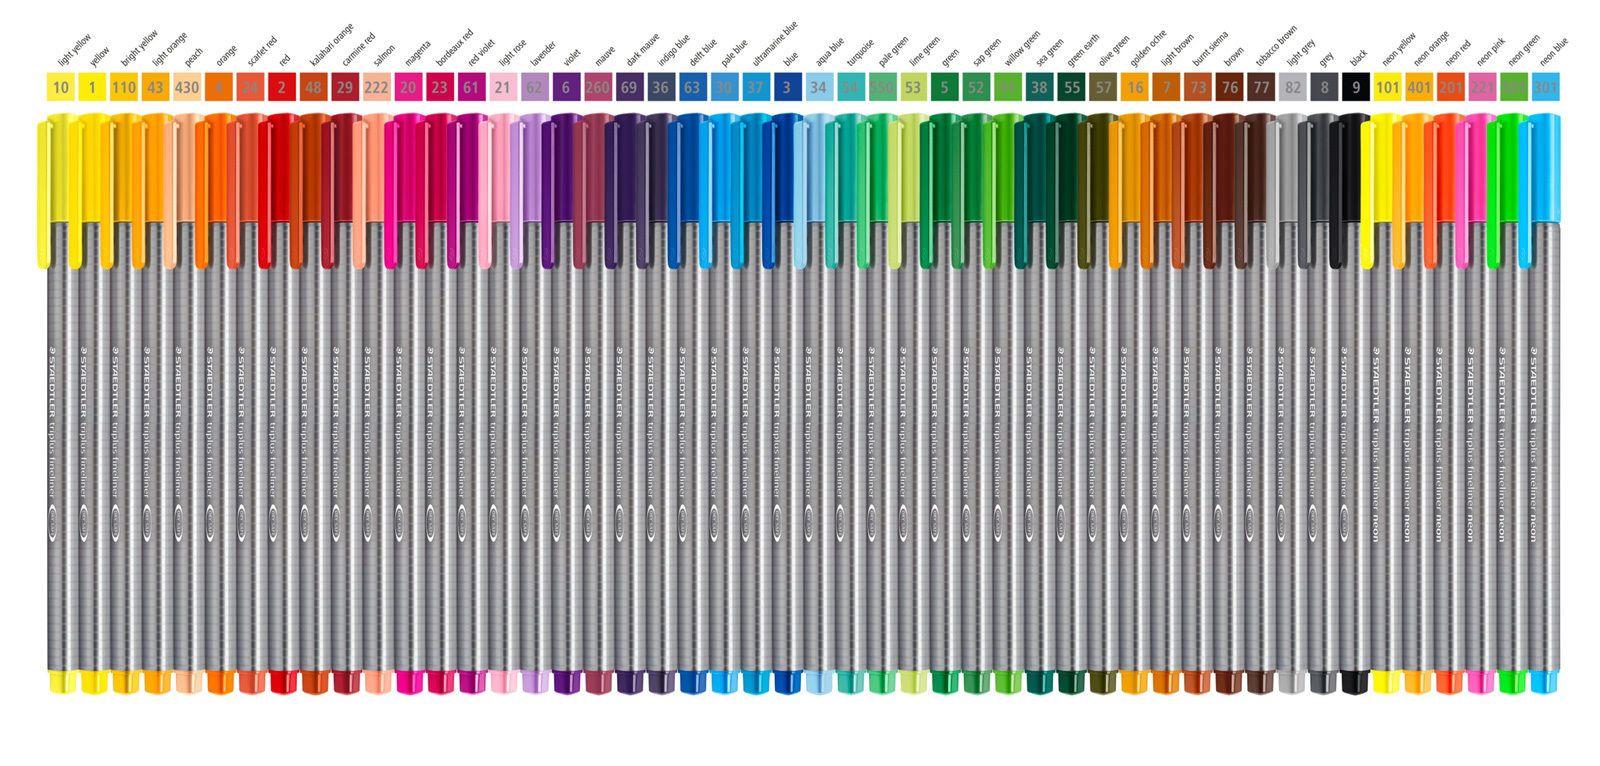 Staedtler Triplus Fineliner 48 Color Chart Staedtler Triplus